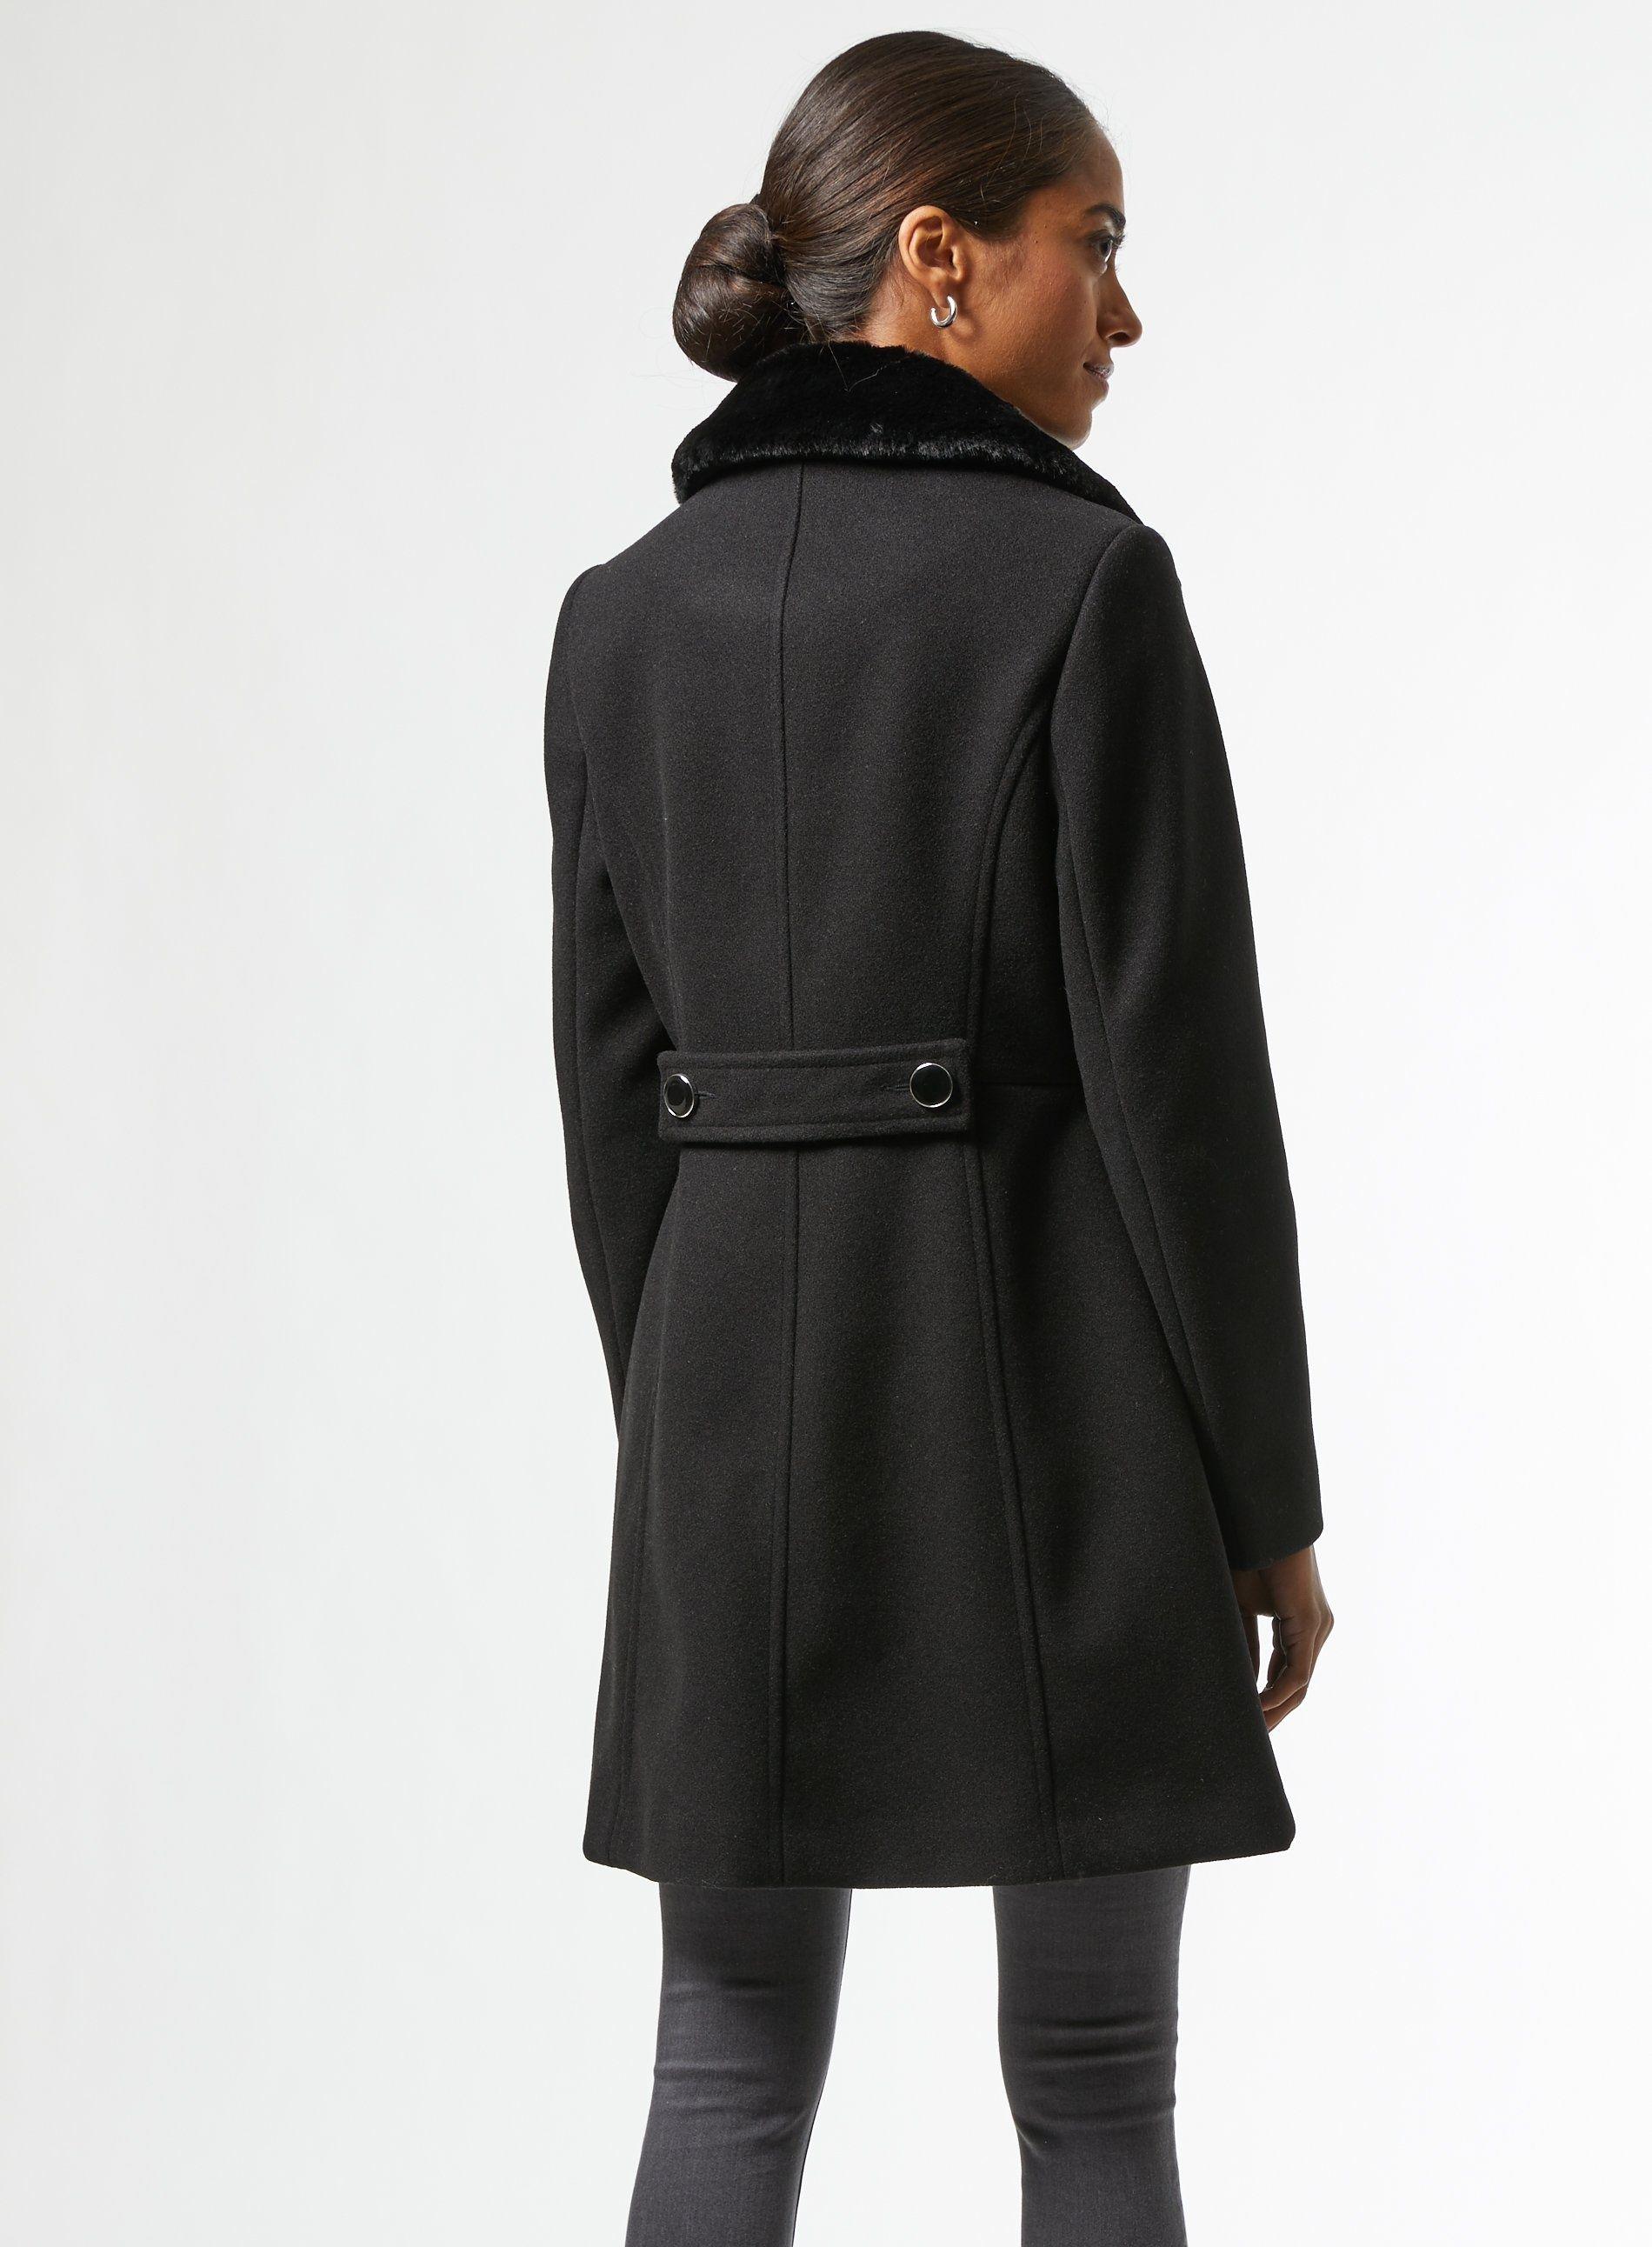 Dorothy Perkins Womens Petite Black Dolly Coat Jacket Outwear Top Warm Winter